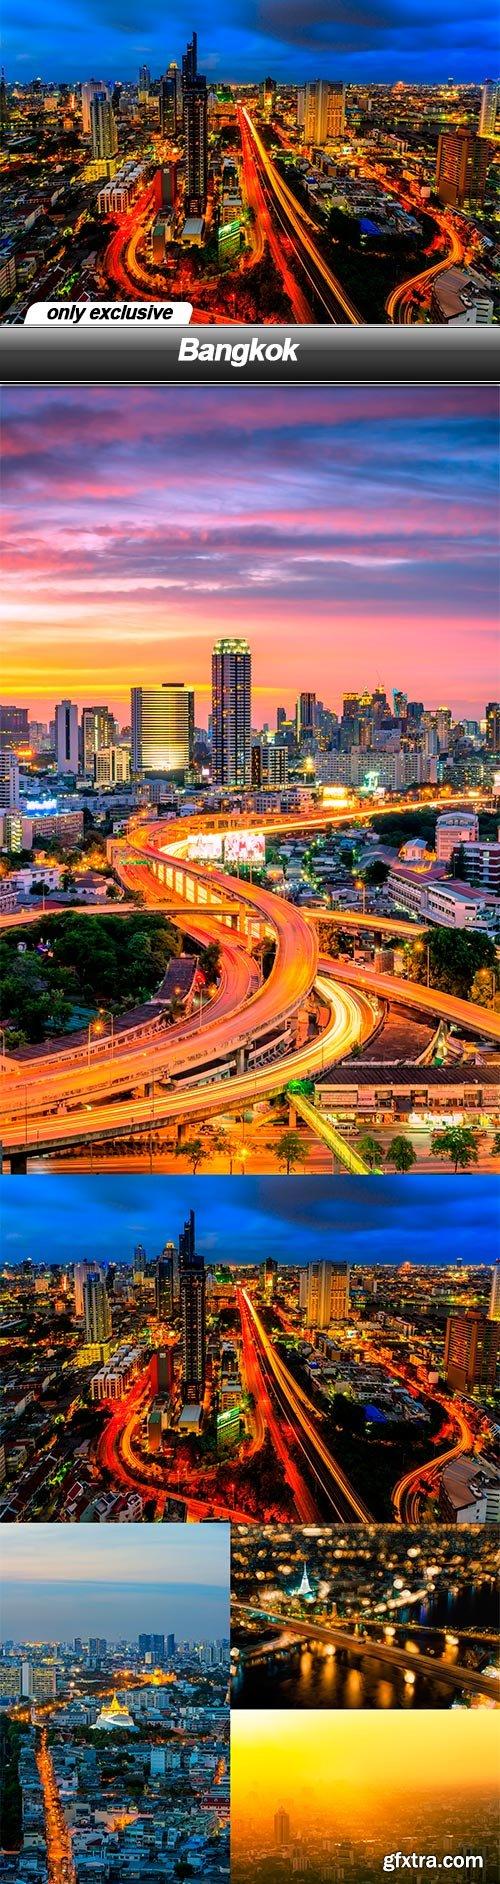 Bangkok - 5 UHQ JPEG